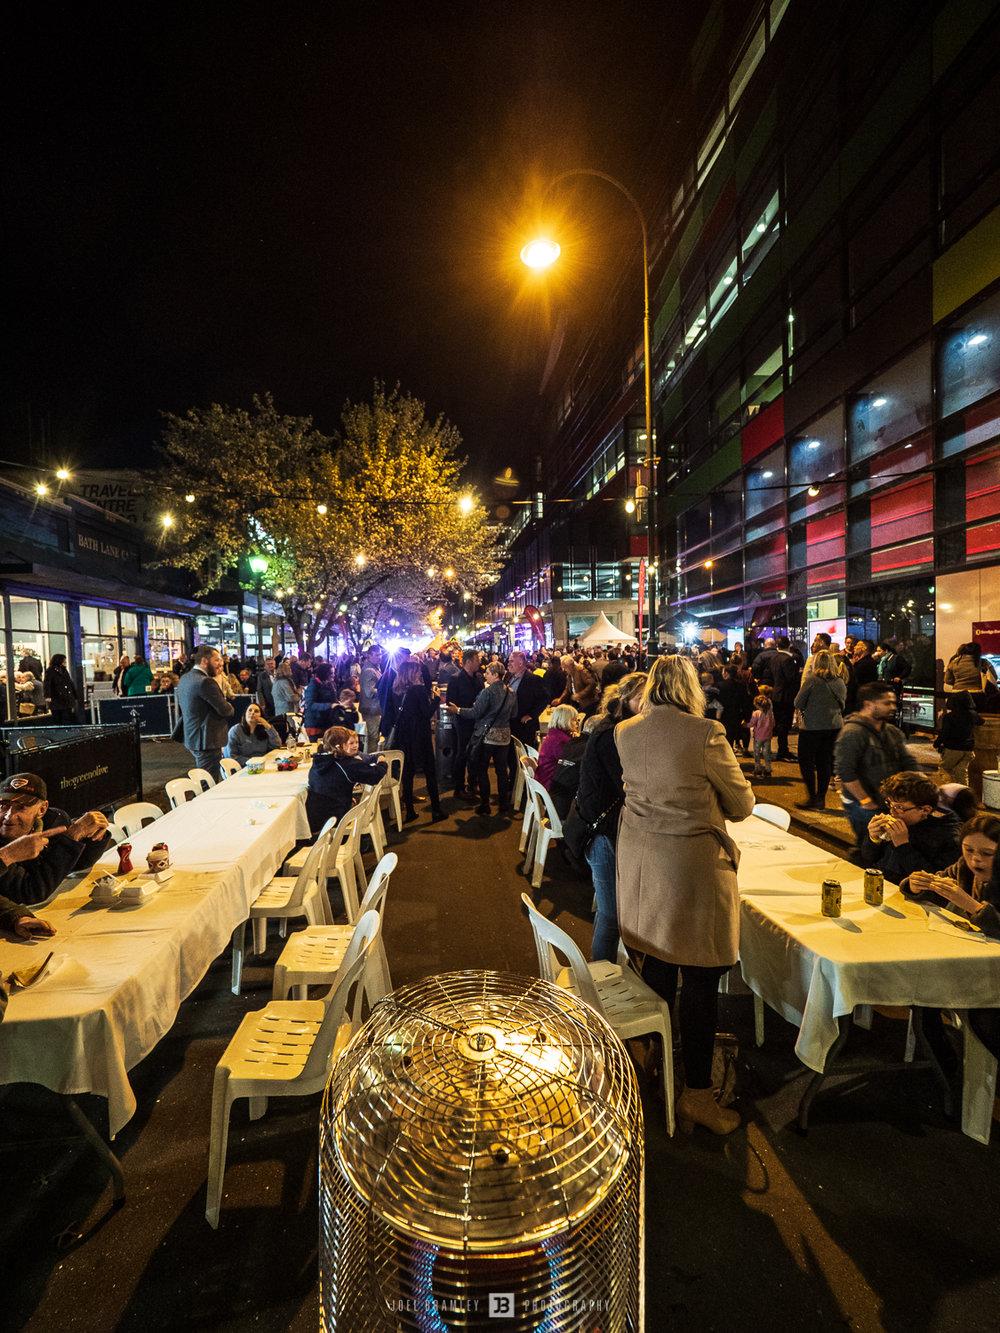 cbnc-street-party-25.jpg